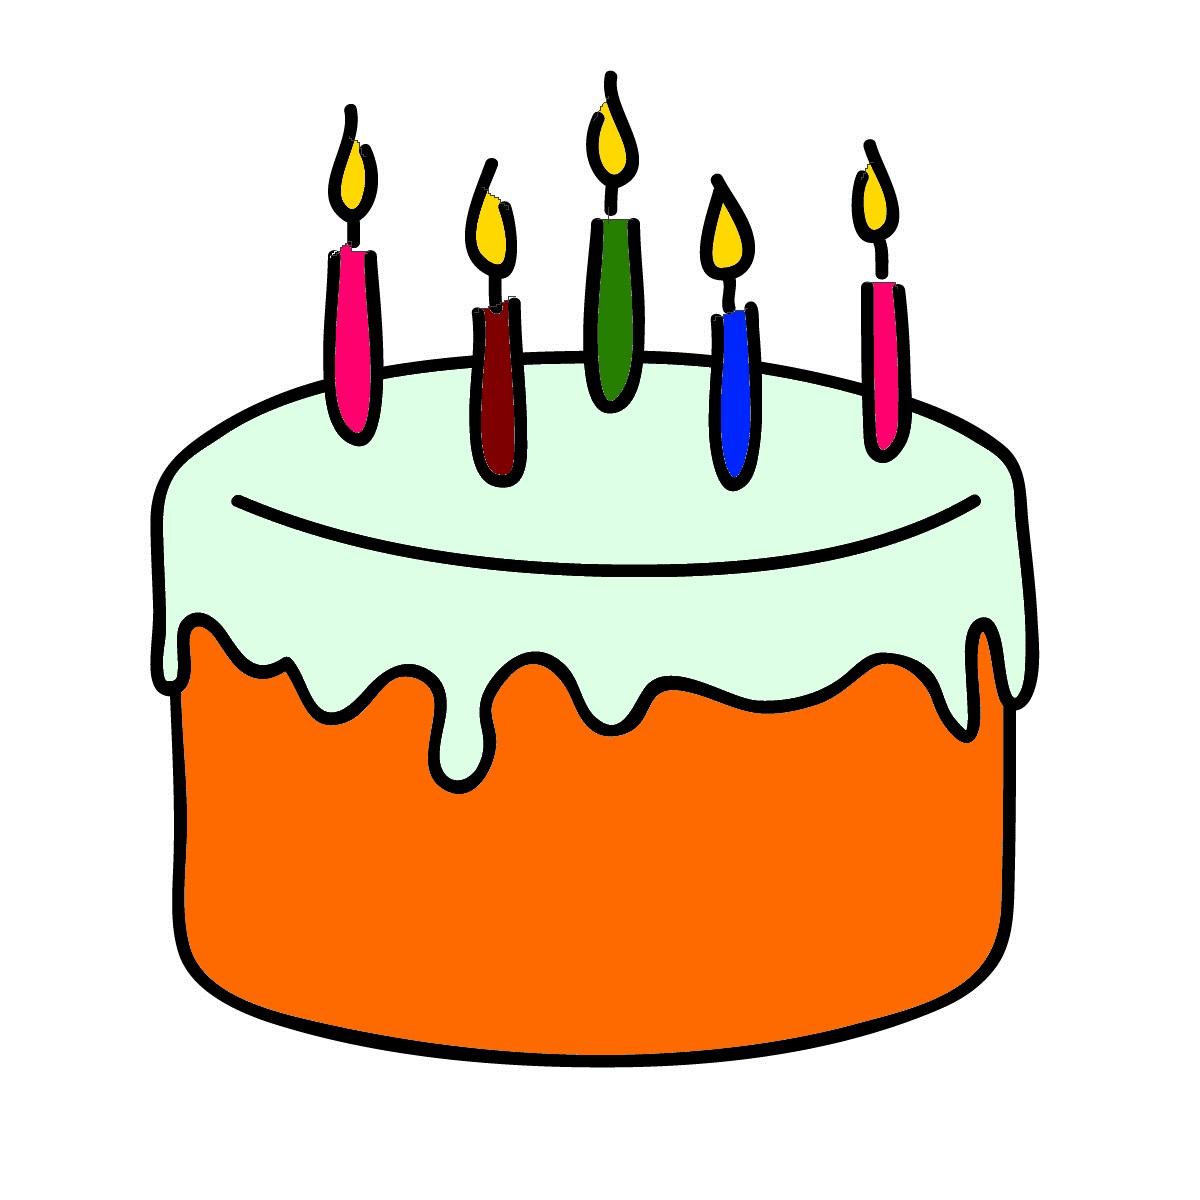 Free Photo Birthday Cake Clipart Birthday Cake Candles Free Download Jooinn